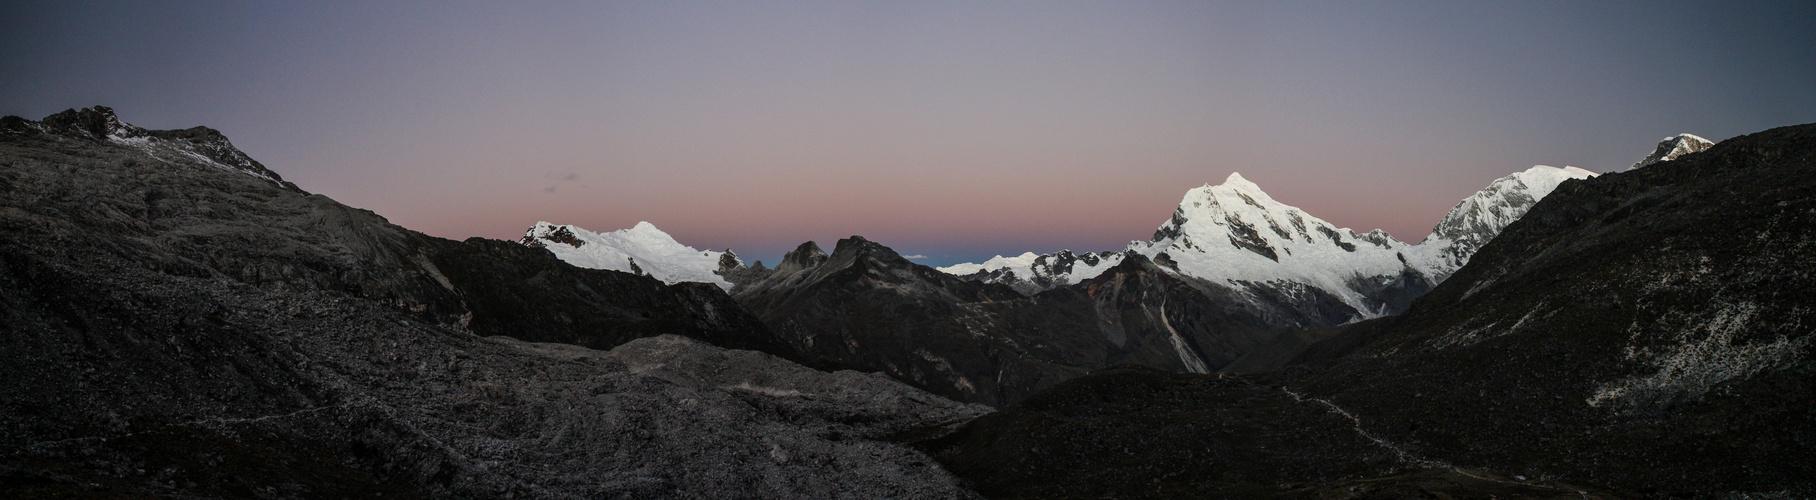 Sonnenuntergang in der Cordillera Blanca